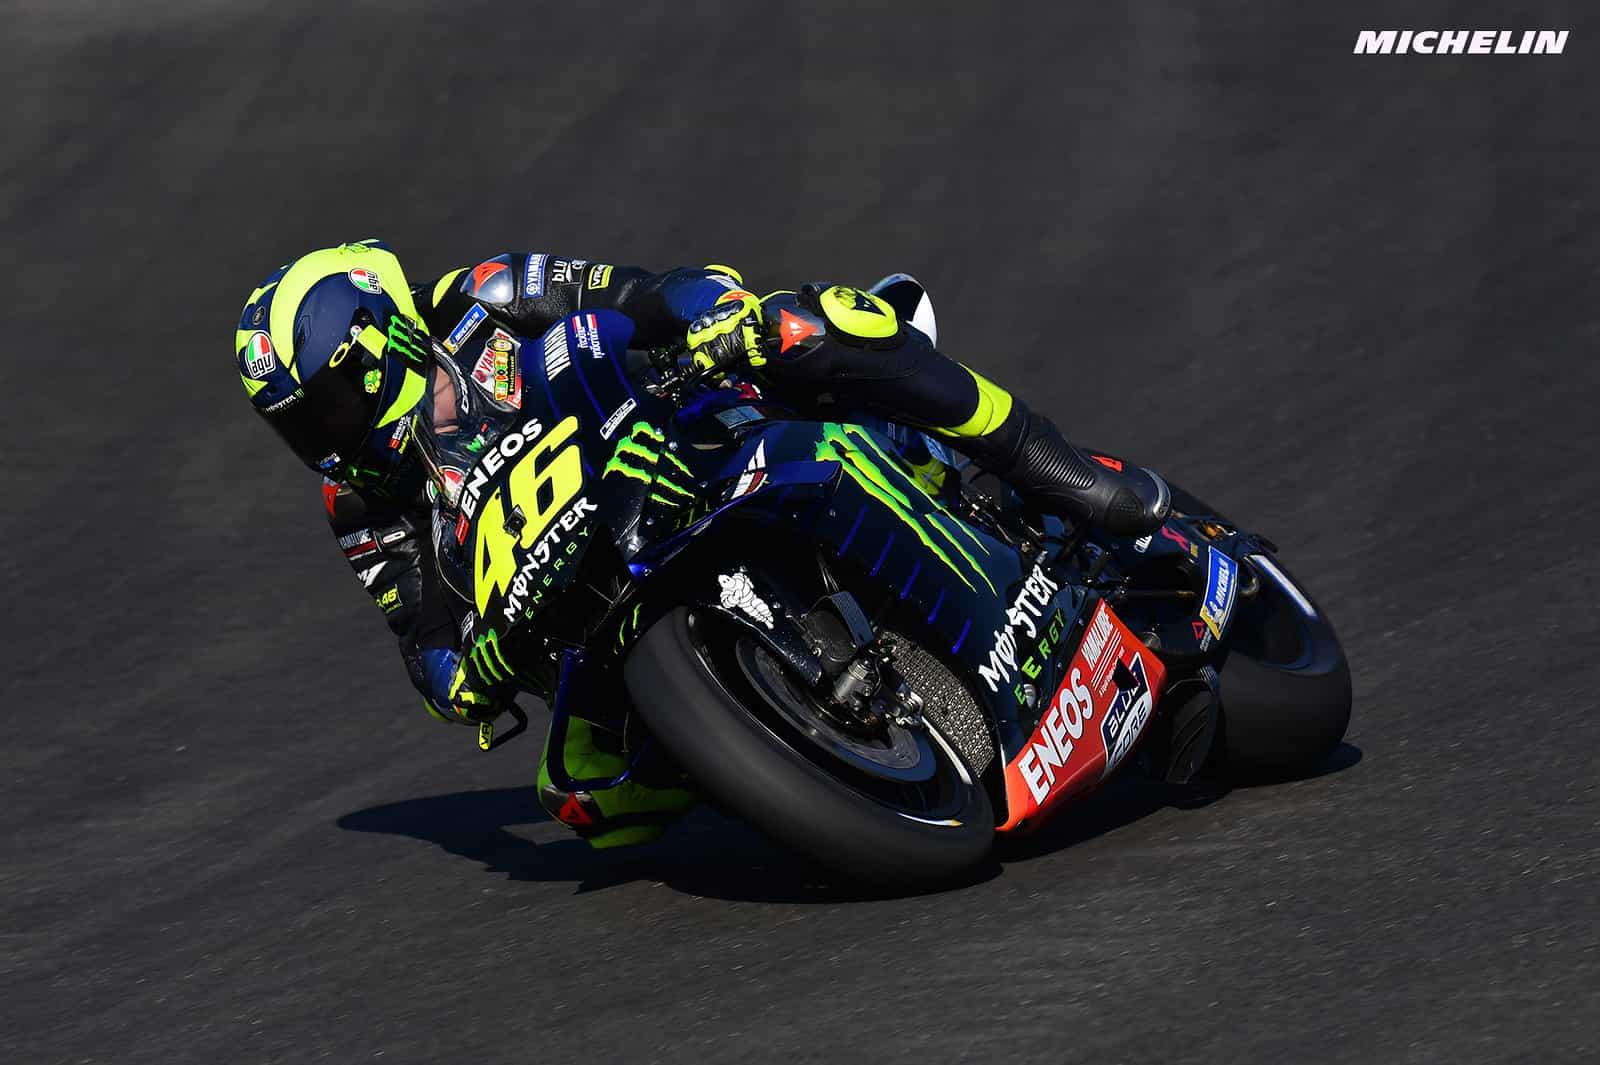 MotoGP2019チェコGP ロッシ「ヤマハは改善が必要、重要な後半戦になる」